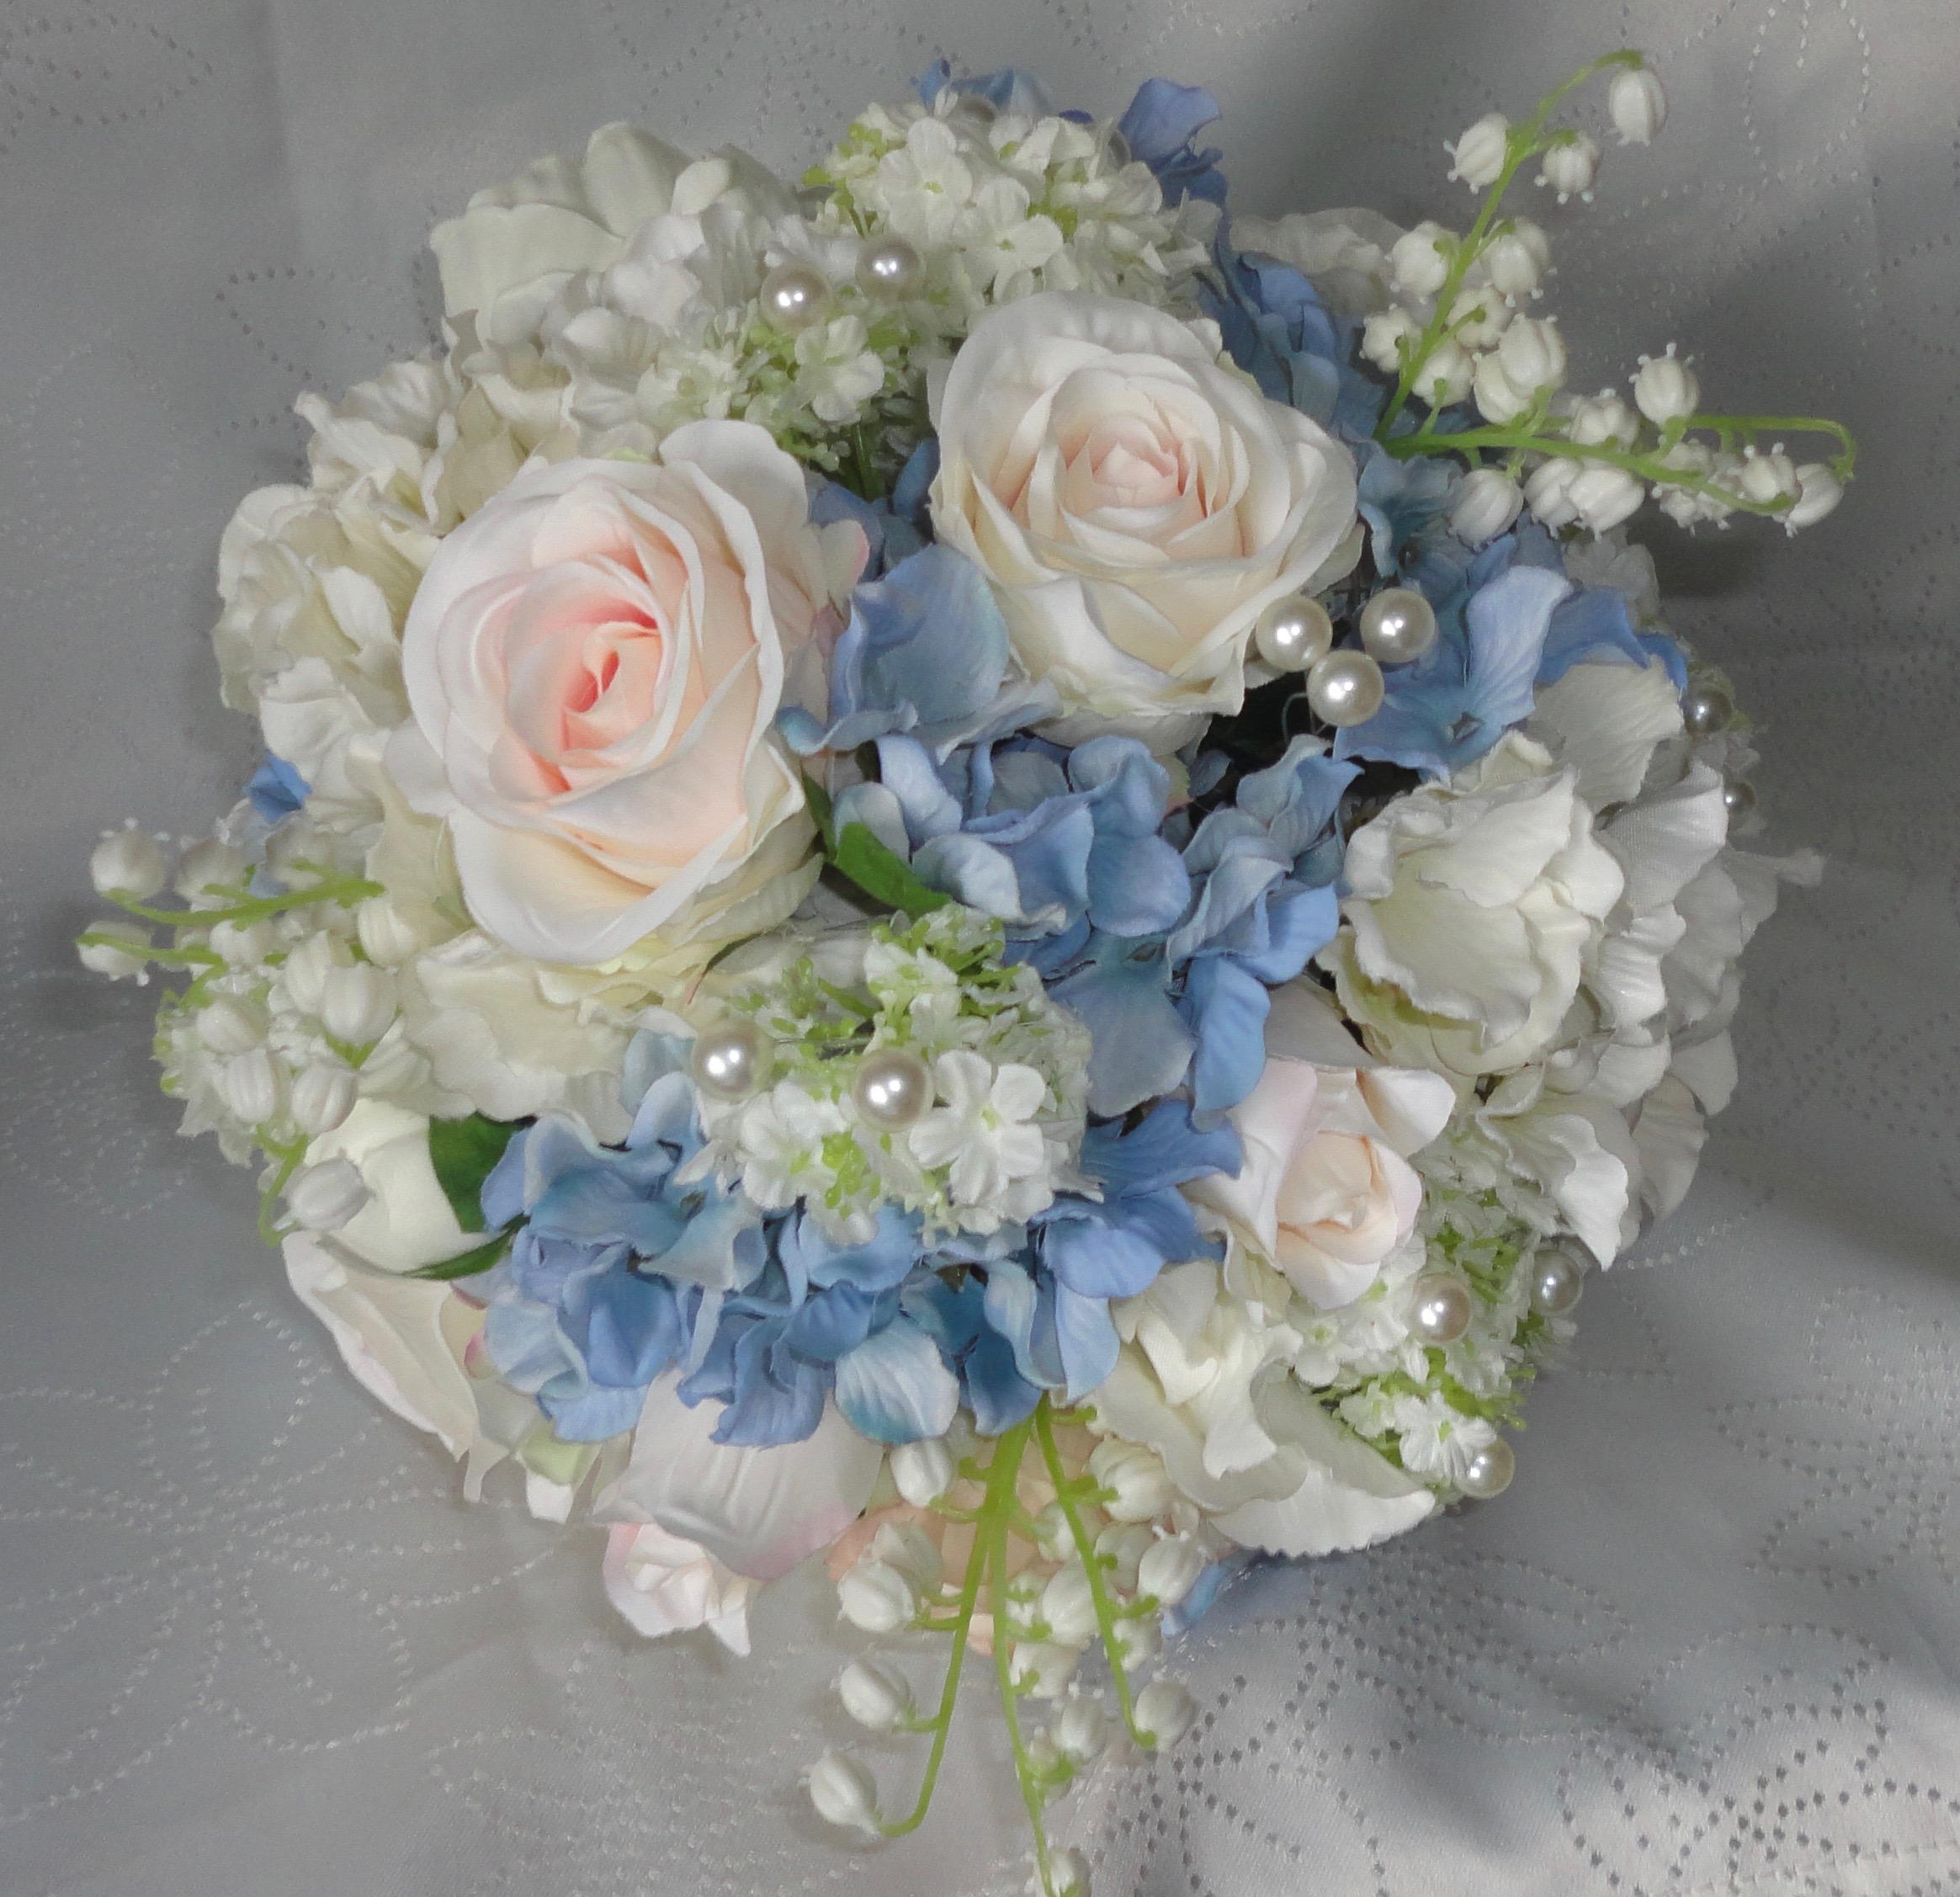 Silk Wedding Bouquets | Silk Wedding Flowers | The Floral ...